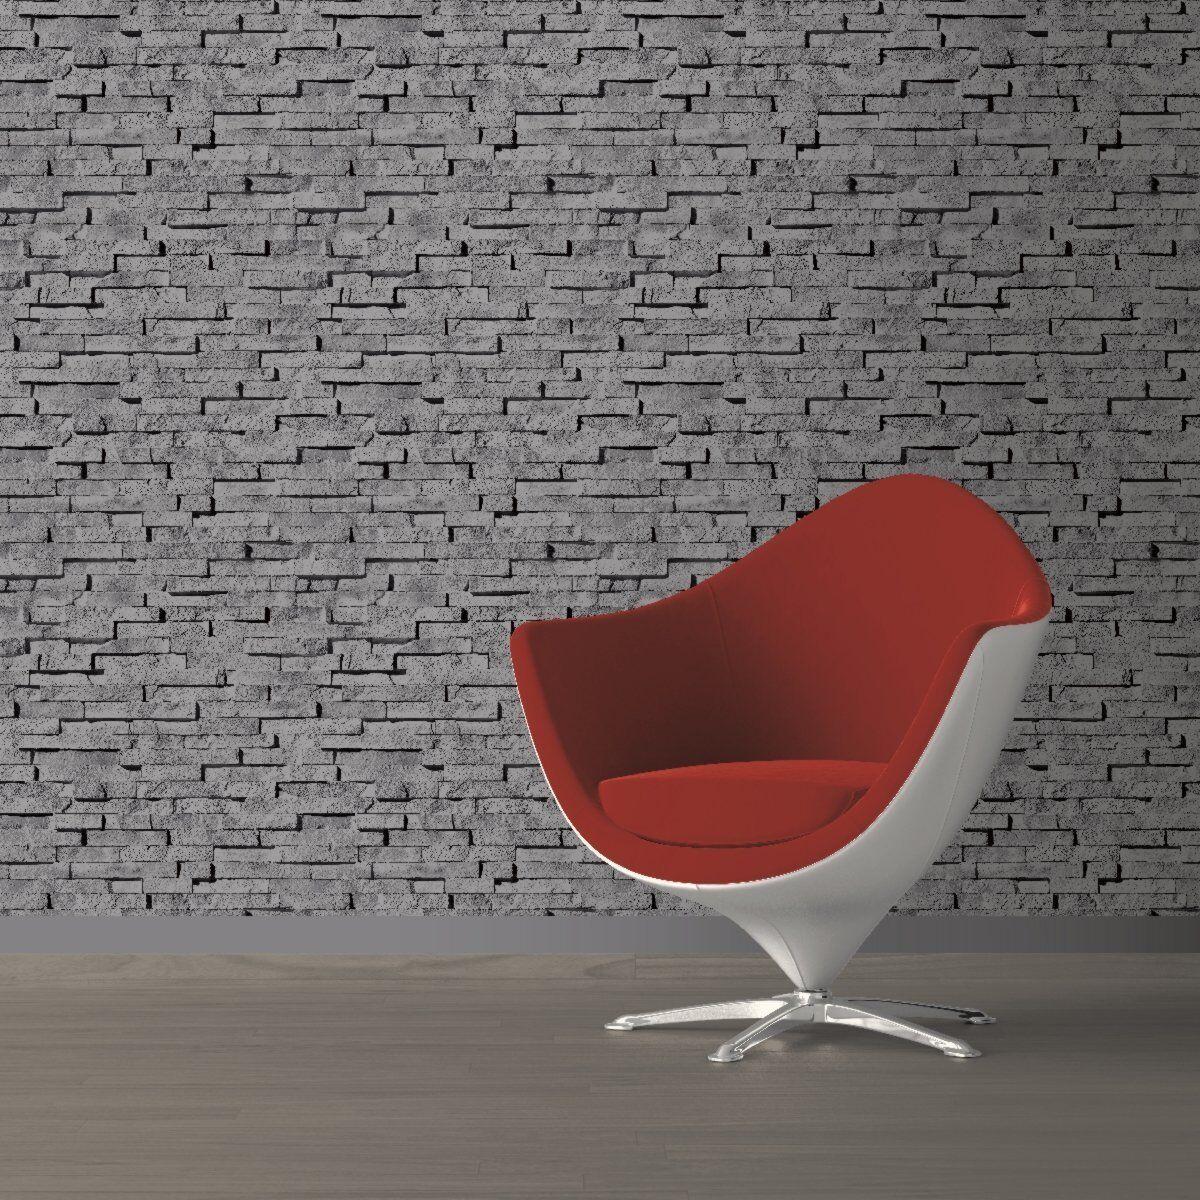 REALISTIC BLUFF GREY SLATE STONE WALL MURIVA DESIGNER VINYL WALLPAPER J27619